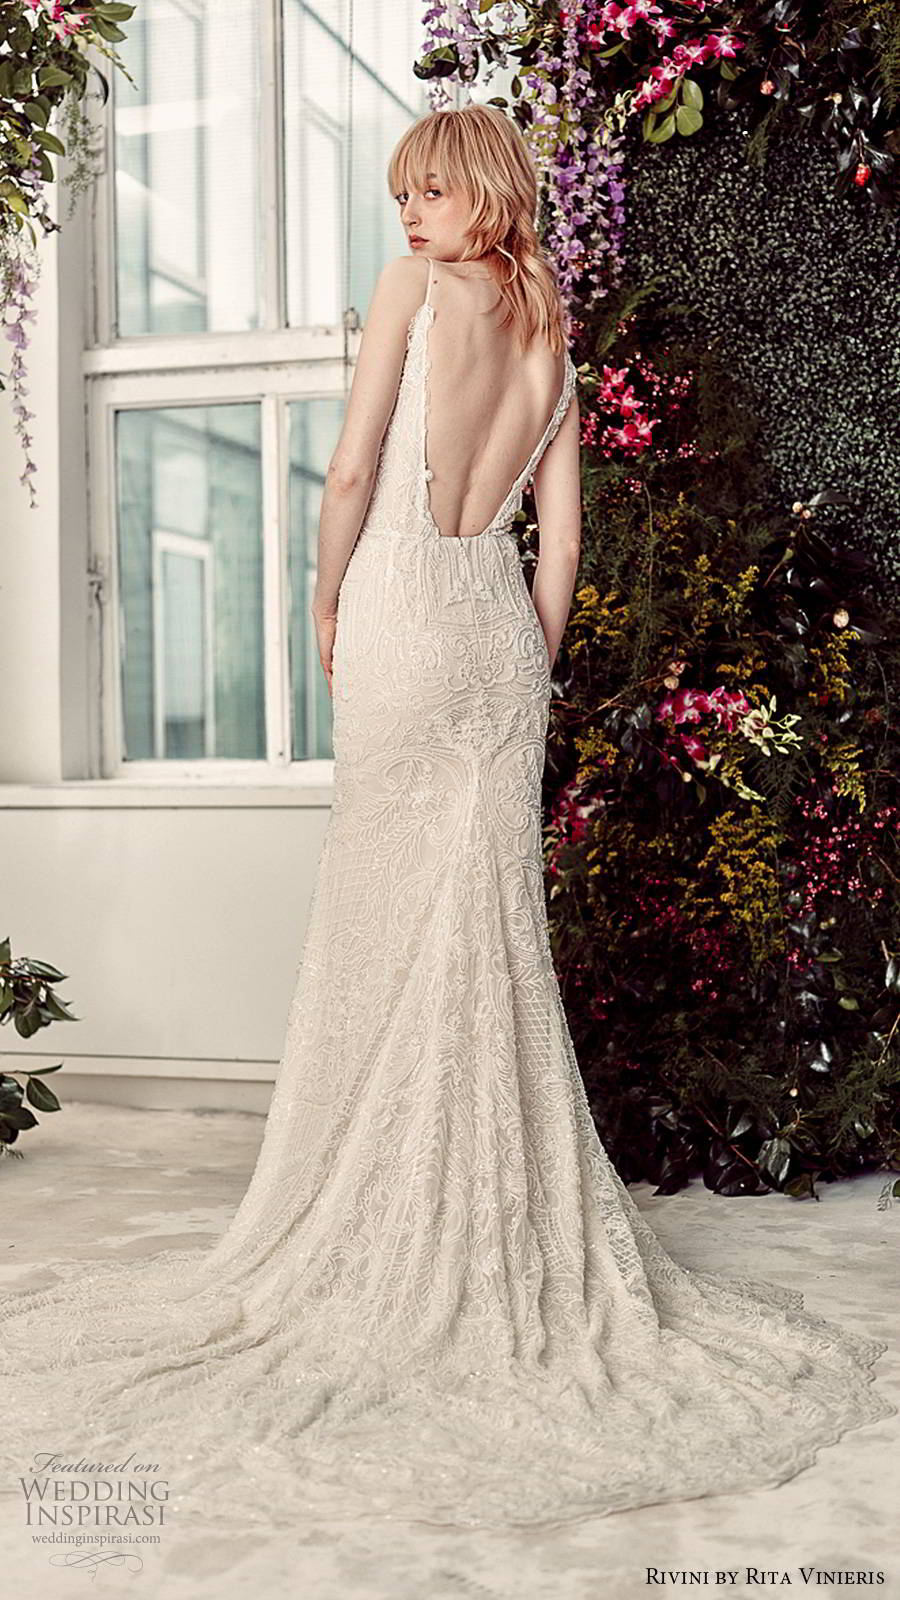 rivini by rita vinieris spring 2020 bridal sleevelses thin straps plunging v neckline fully embellished glam sheath wedding dress open back chapel train (6) bv